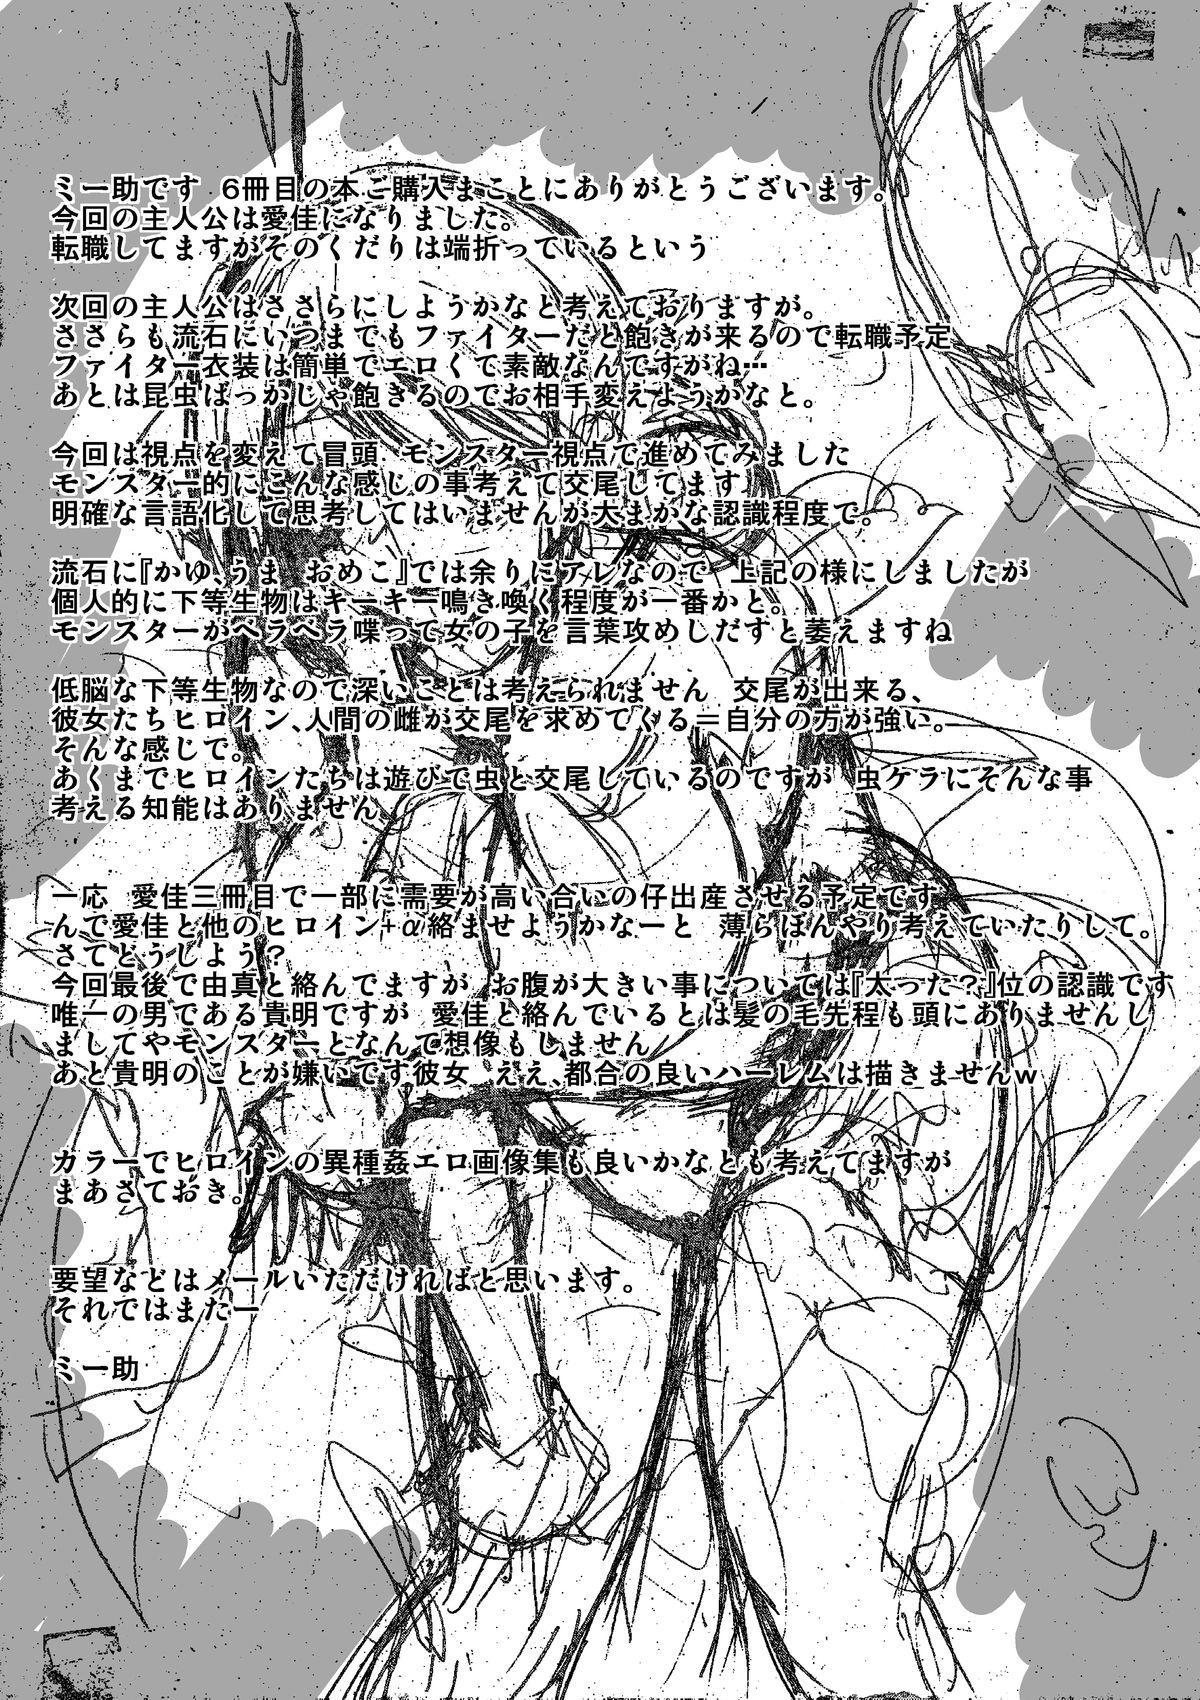 [Tiba-Santi] Dungeon Travelers - Manaka no Himegoto 2 | Dungeon Travelers - Manaka's Secret 2 (ToHeart2 Dungeon Travelers) [English] {Mant} [Digital] 26